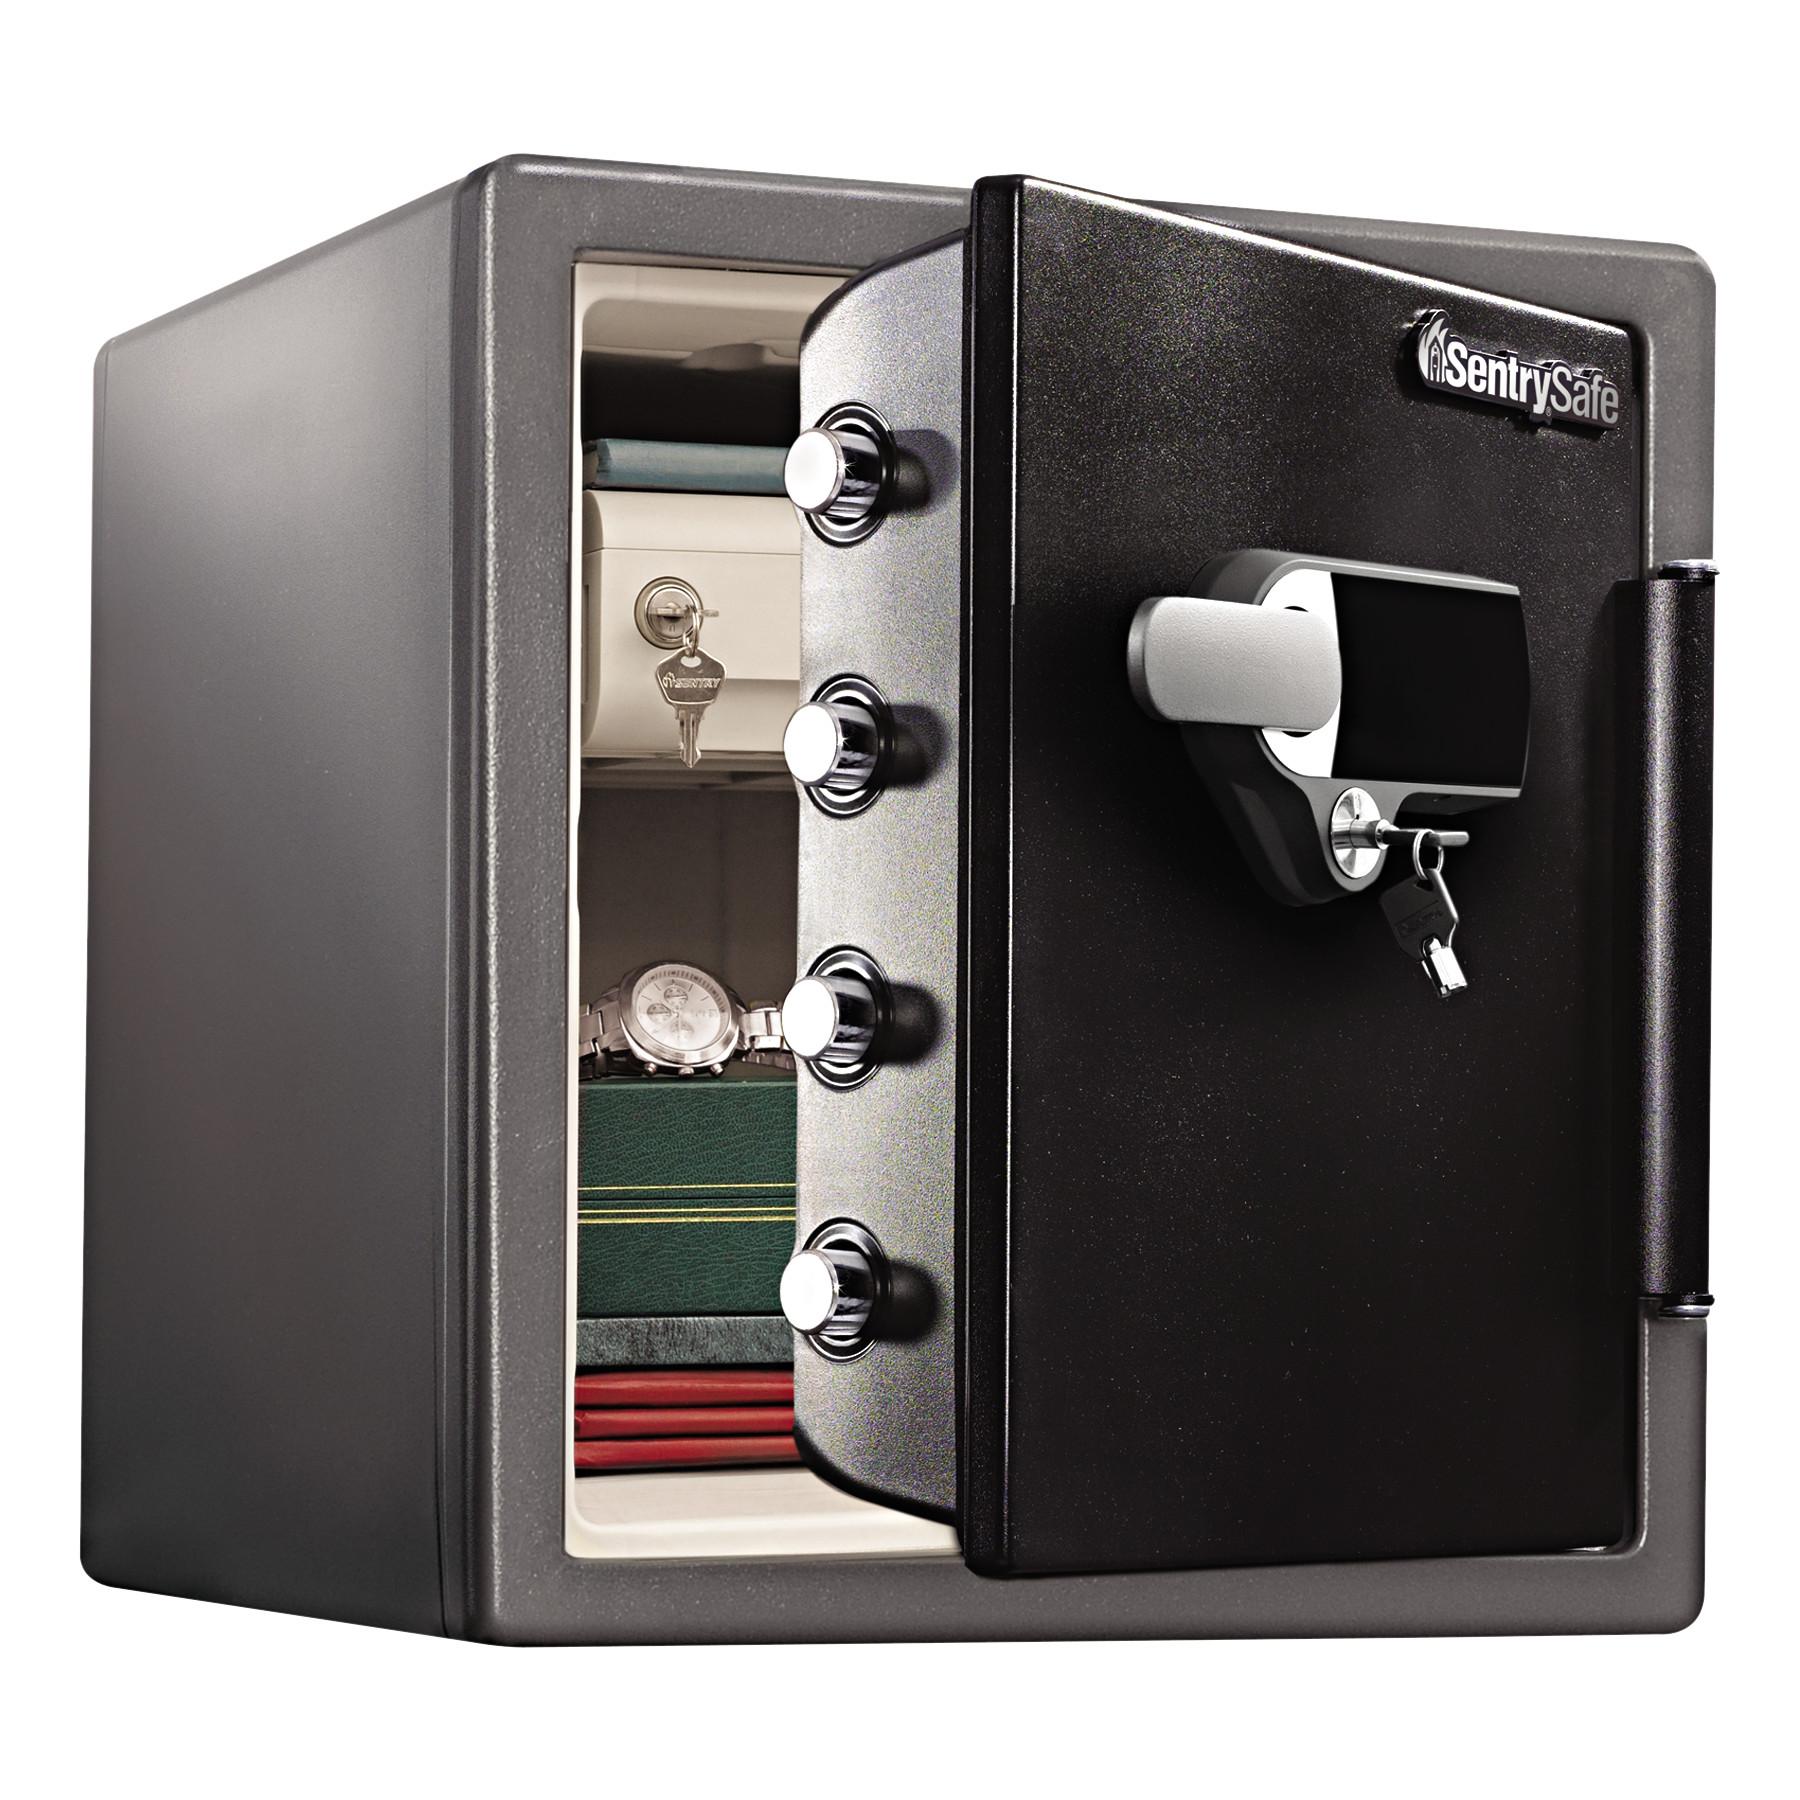 Sentry Safe Fire-Safe 1.23 ft3 Touchscreen w/Alarm, 16 3/...